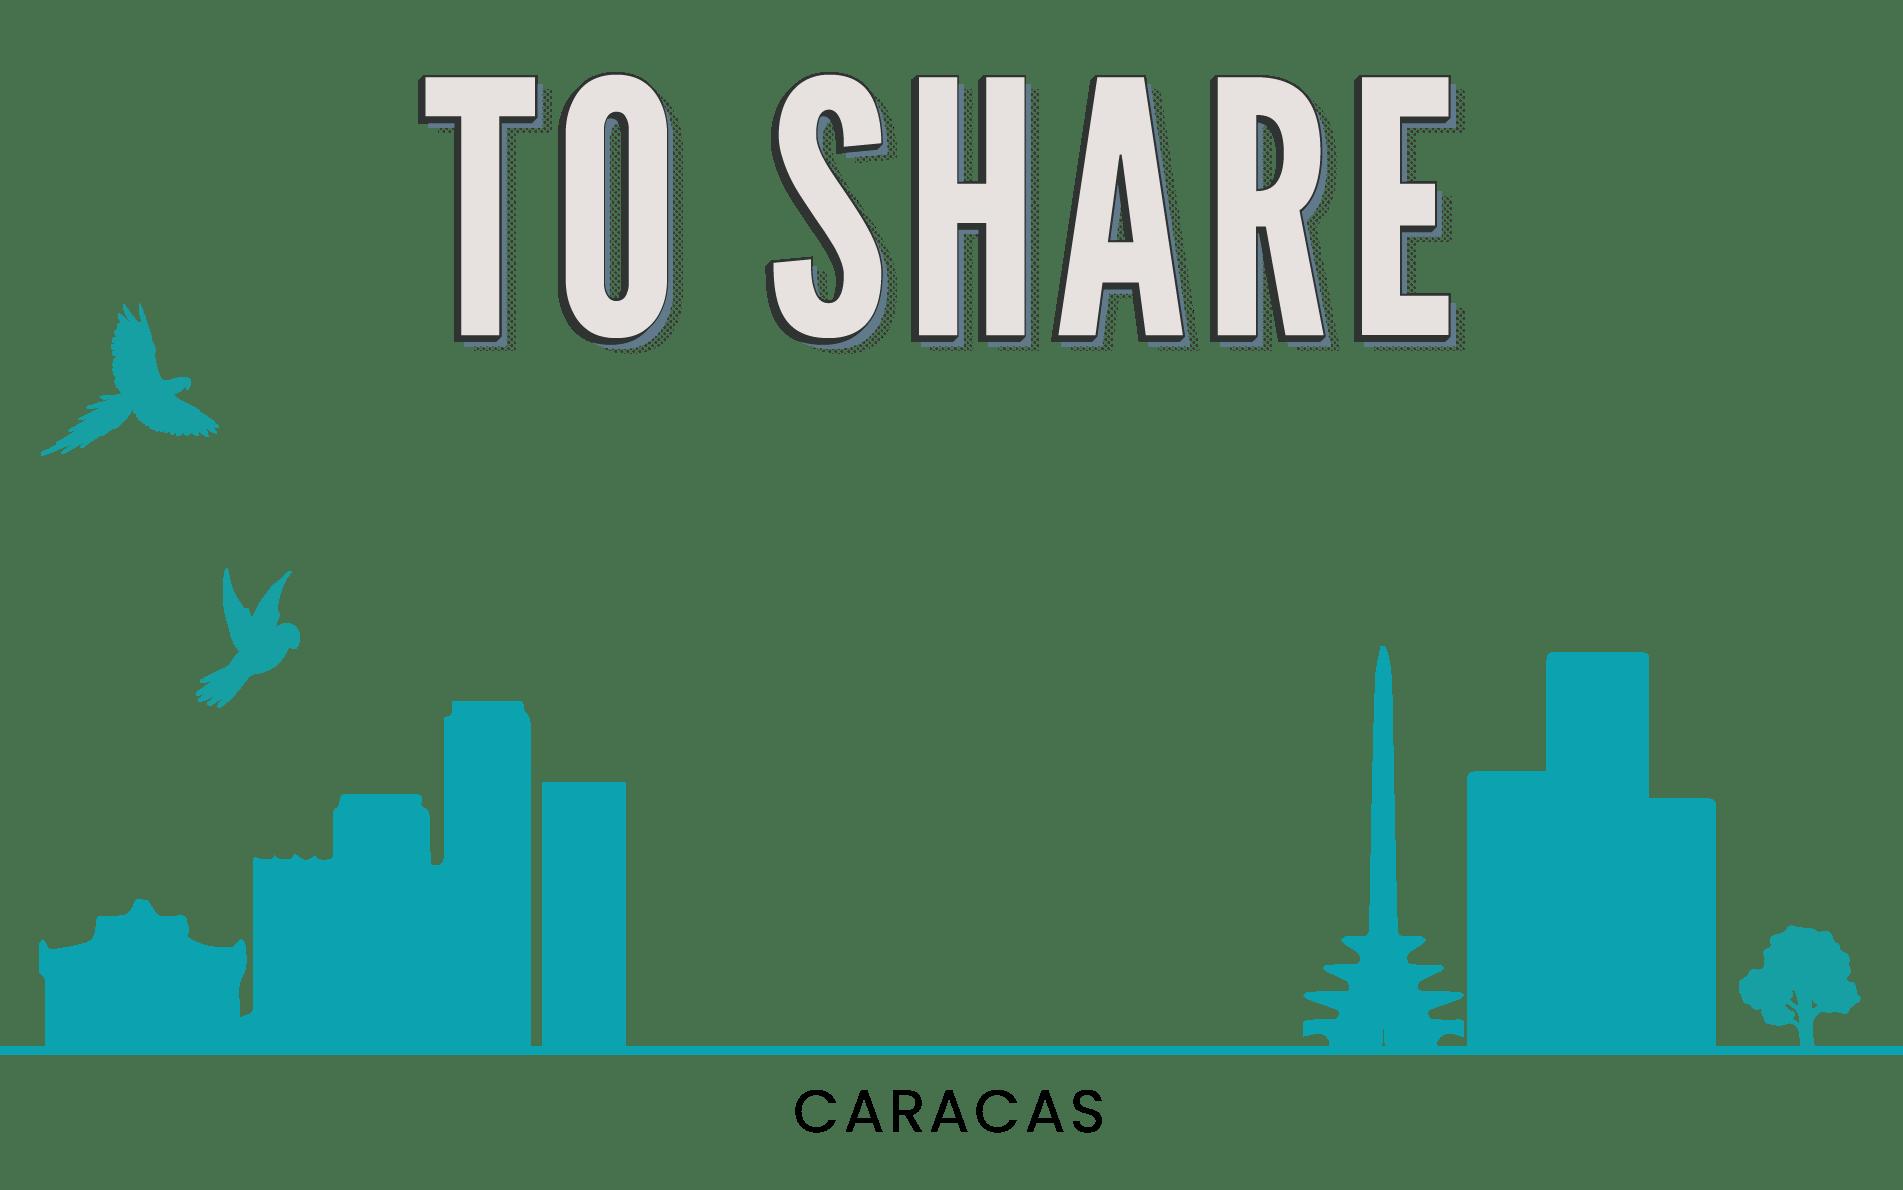 CARACAS_1 to share